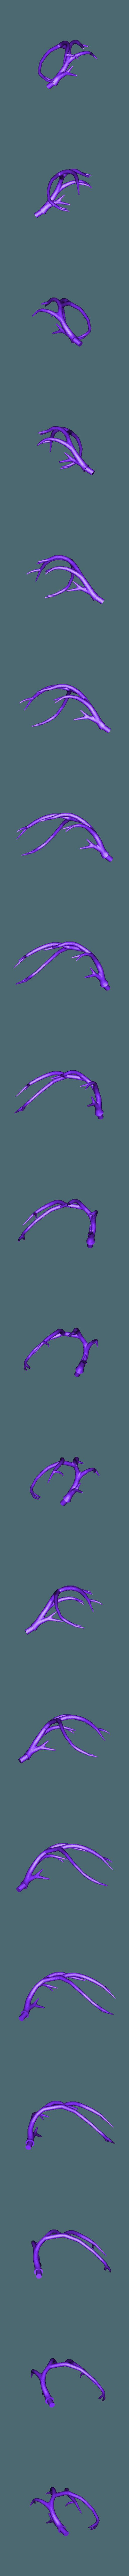 Deer-2.stl Télécharger fichier STL gratuit Reindeer with an antlers twist! • Objet imprimable en 3D, serial_print3r